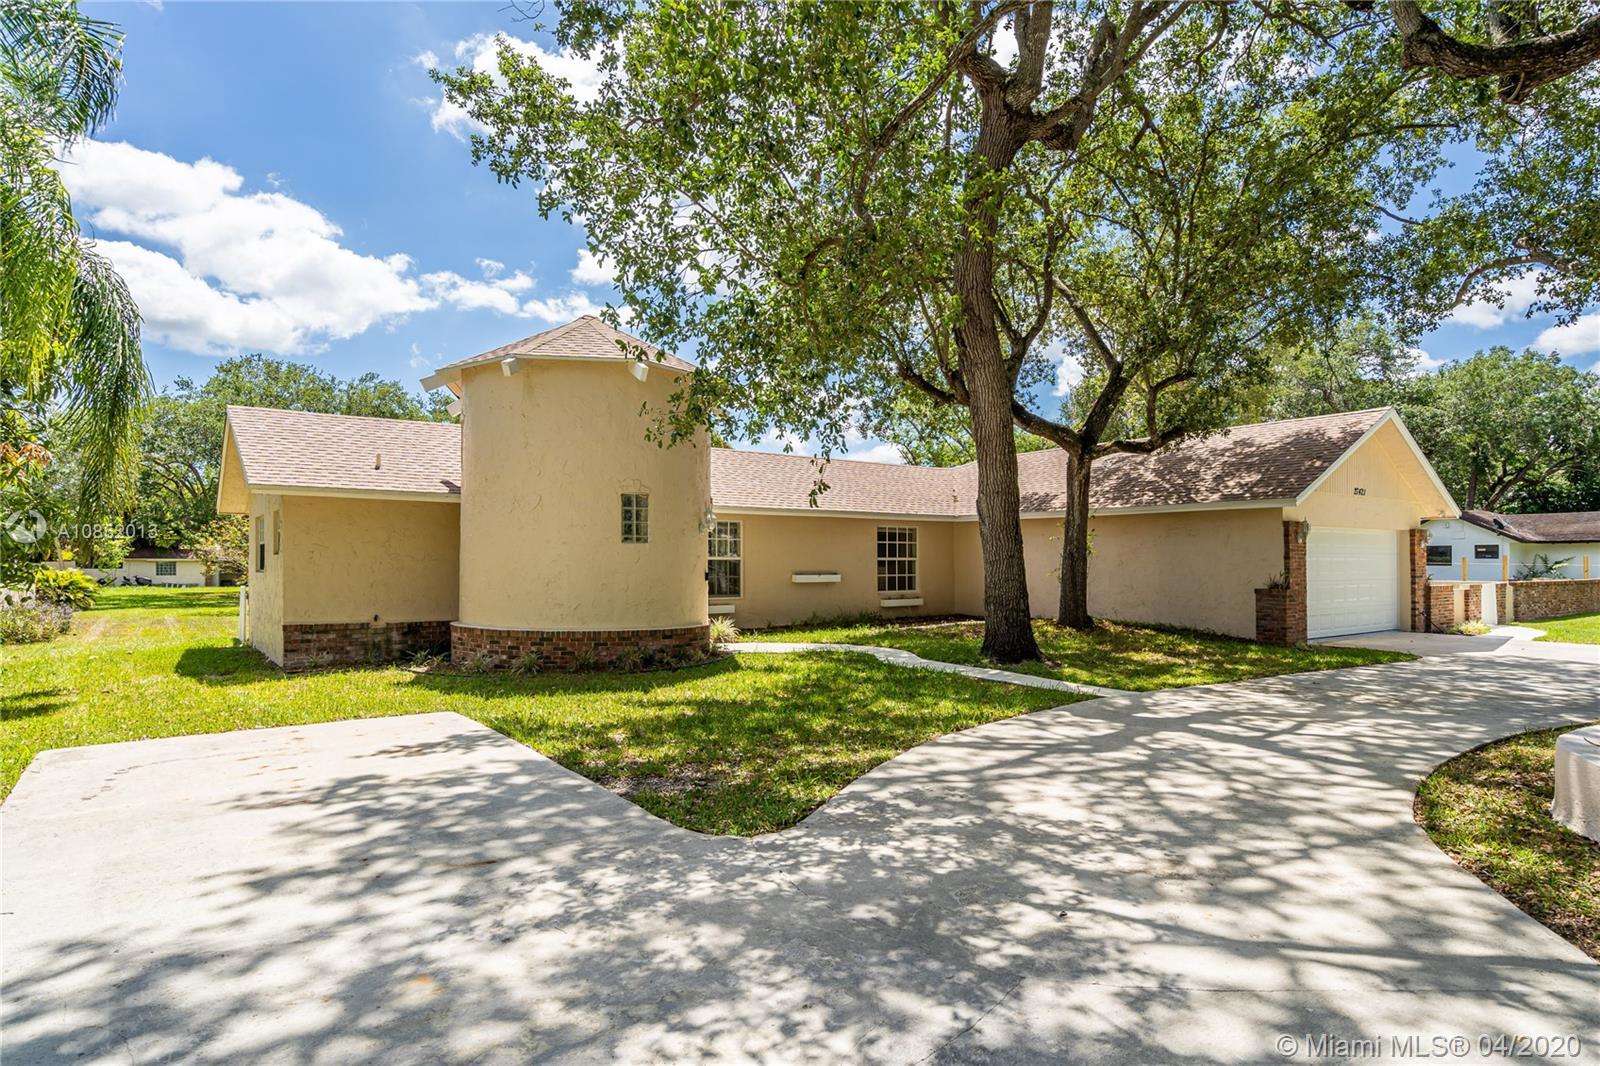 27421 SW 154th Ave, Homestead, FL 33032 - Homestead, FL real estate listing